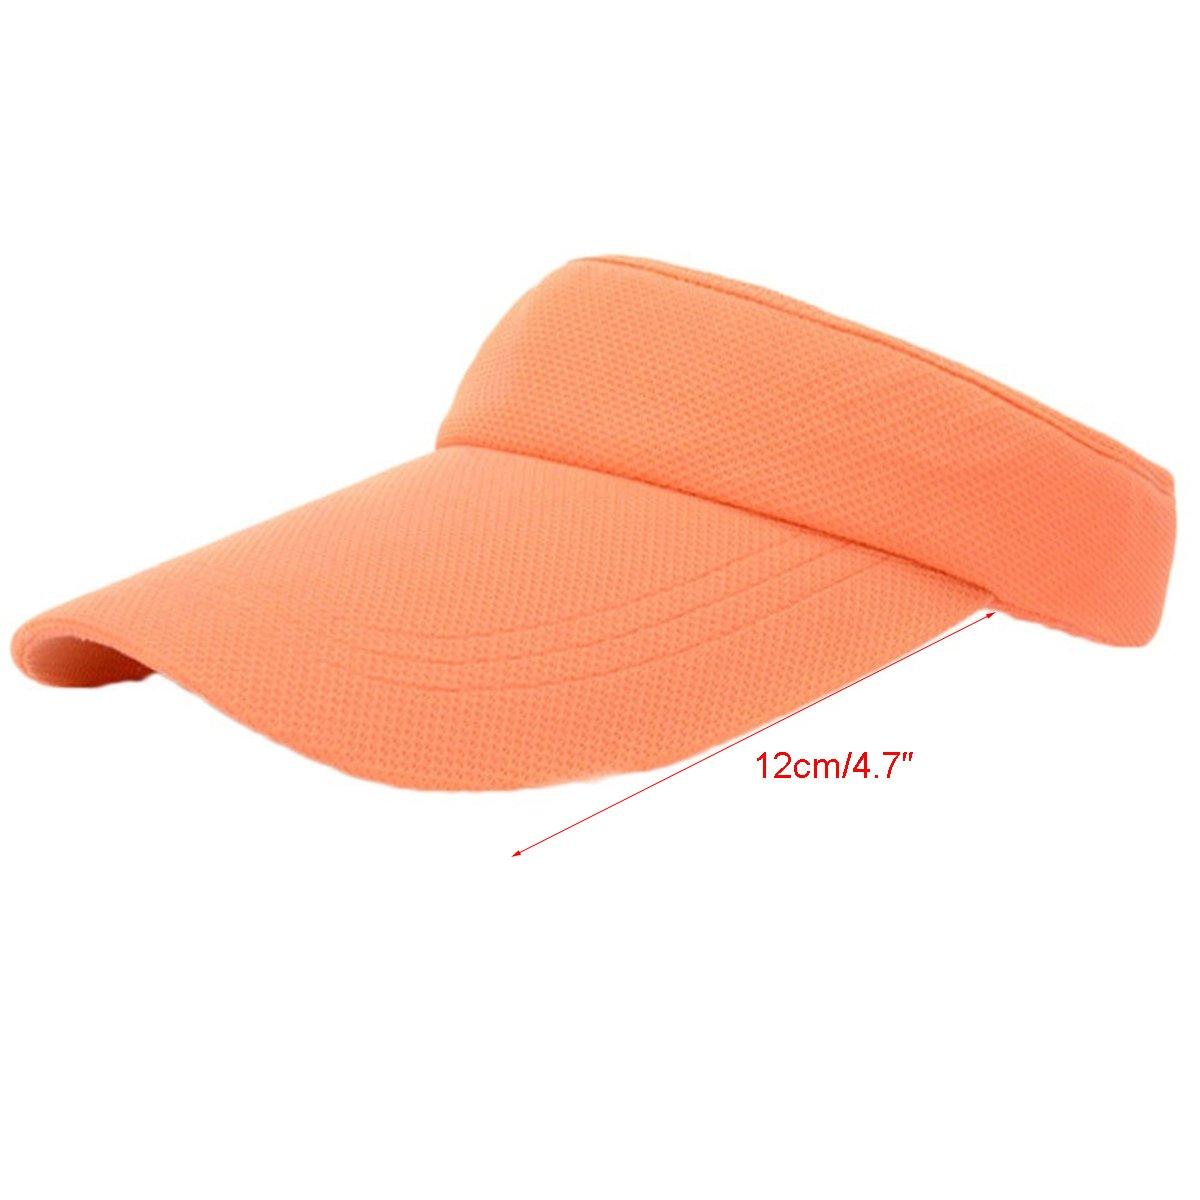 Evaliana UV Protection Thicker Sweatband Visor Sun Hat Cycling Fishing Tennis Running Cap